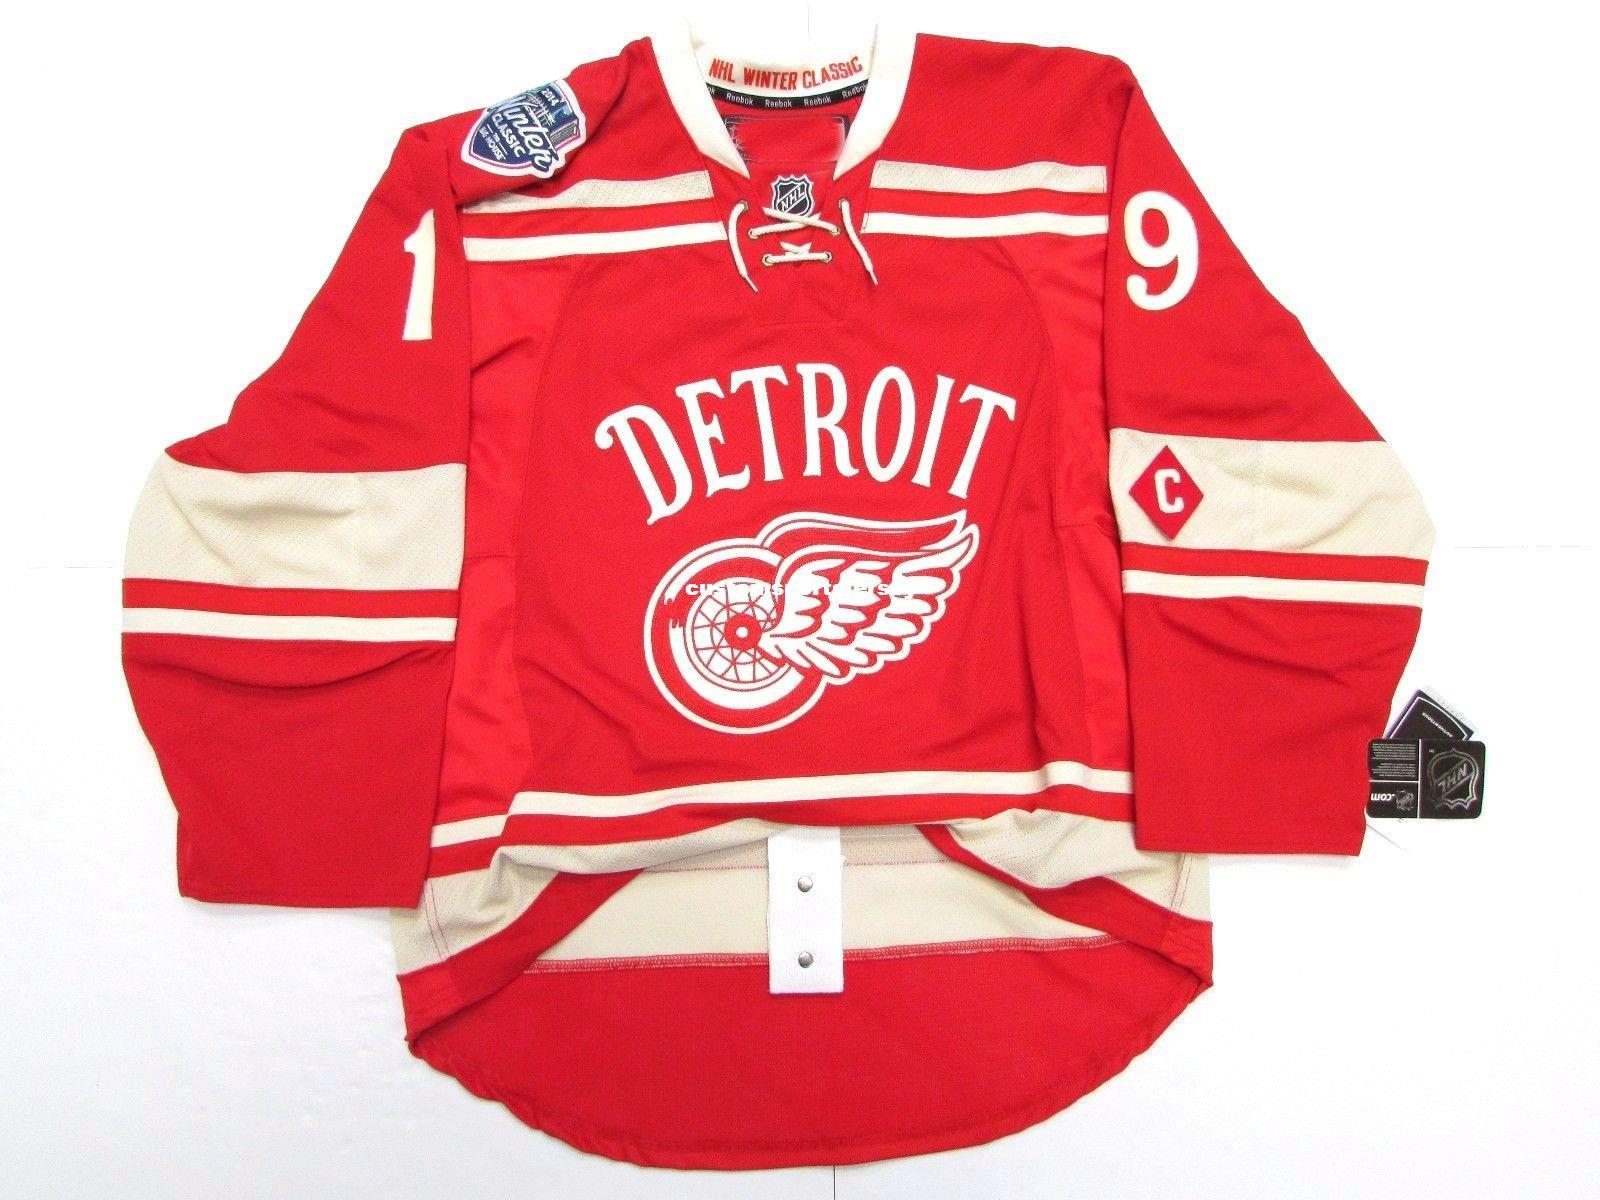 2019 Cheap Custom YZERMAN DETROIT RED WINGS 2014 WINTER CLASSIC JERSEY  Stitch Add Any Number Any Name Mens Hockey Jersey XS 5XL From  Customsportsjersey 616c1452e